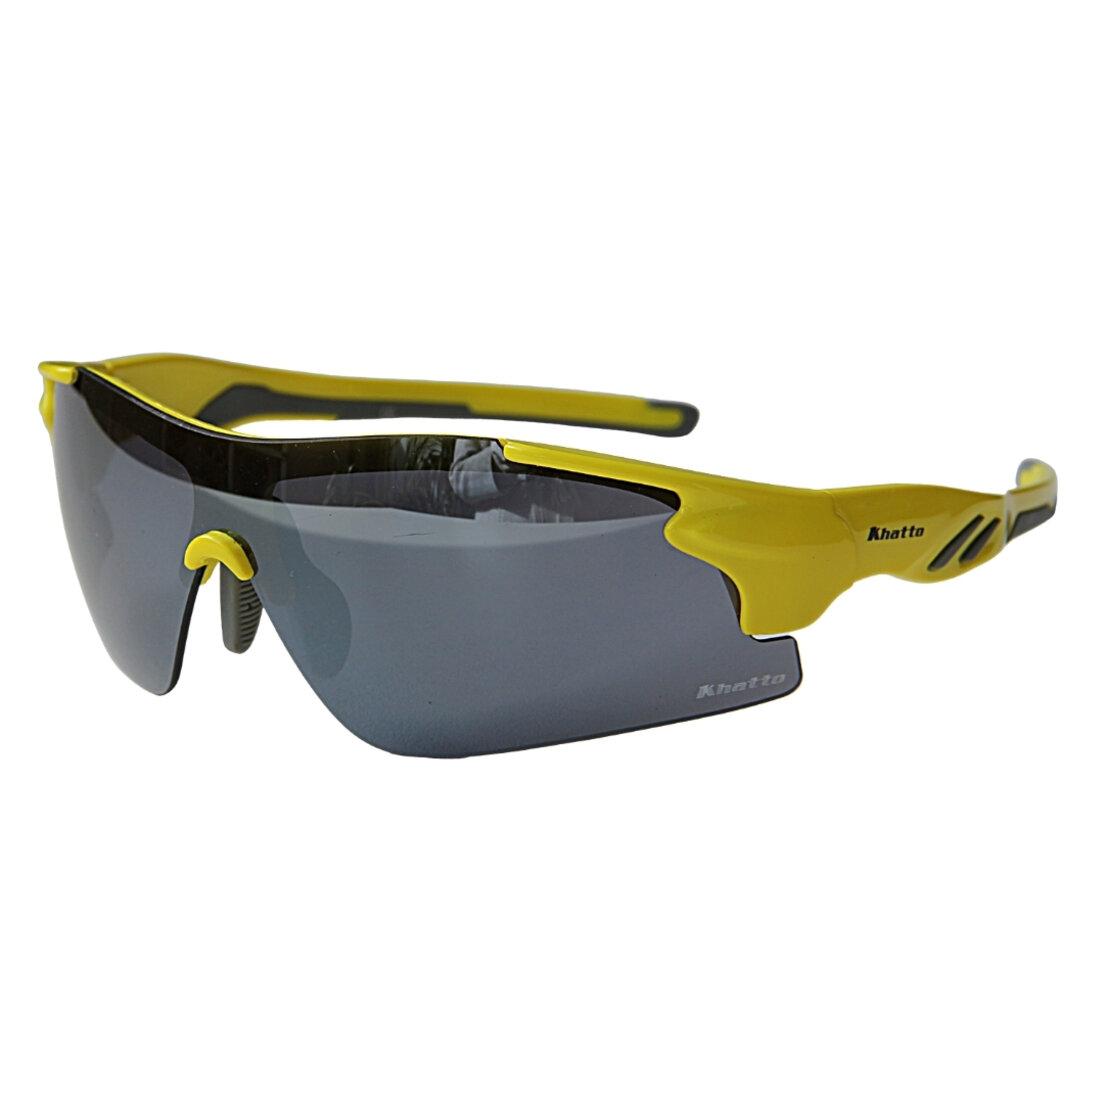 OUTLET - Óculos de Sol Khatto Esportivo Fly